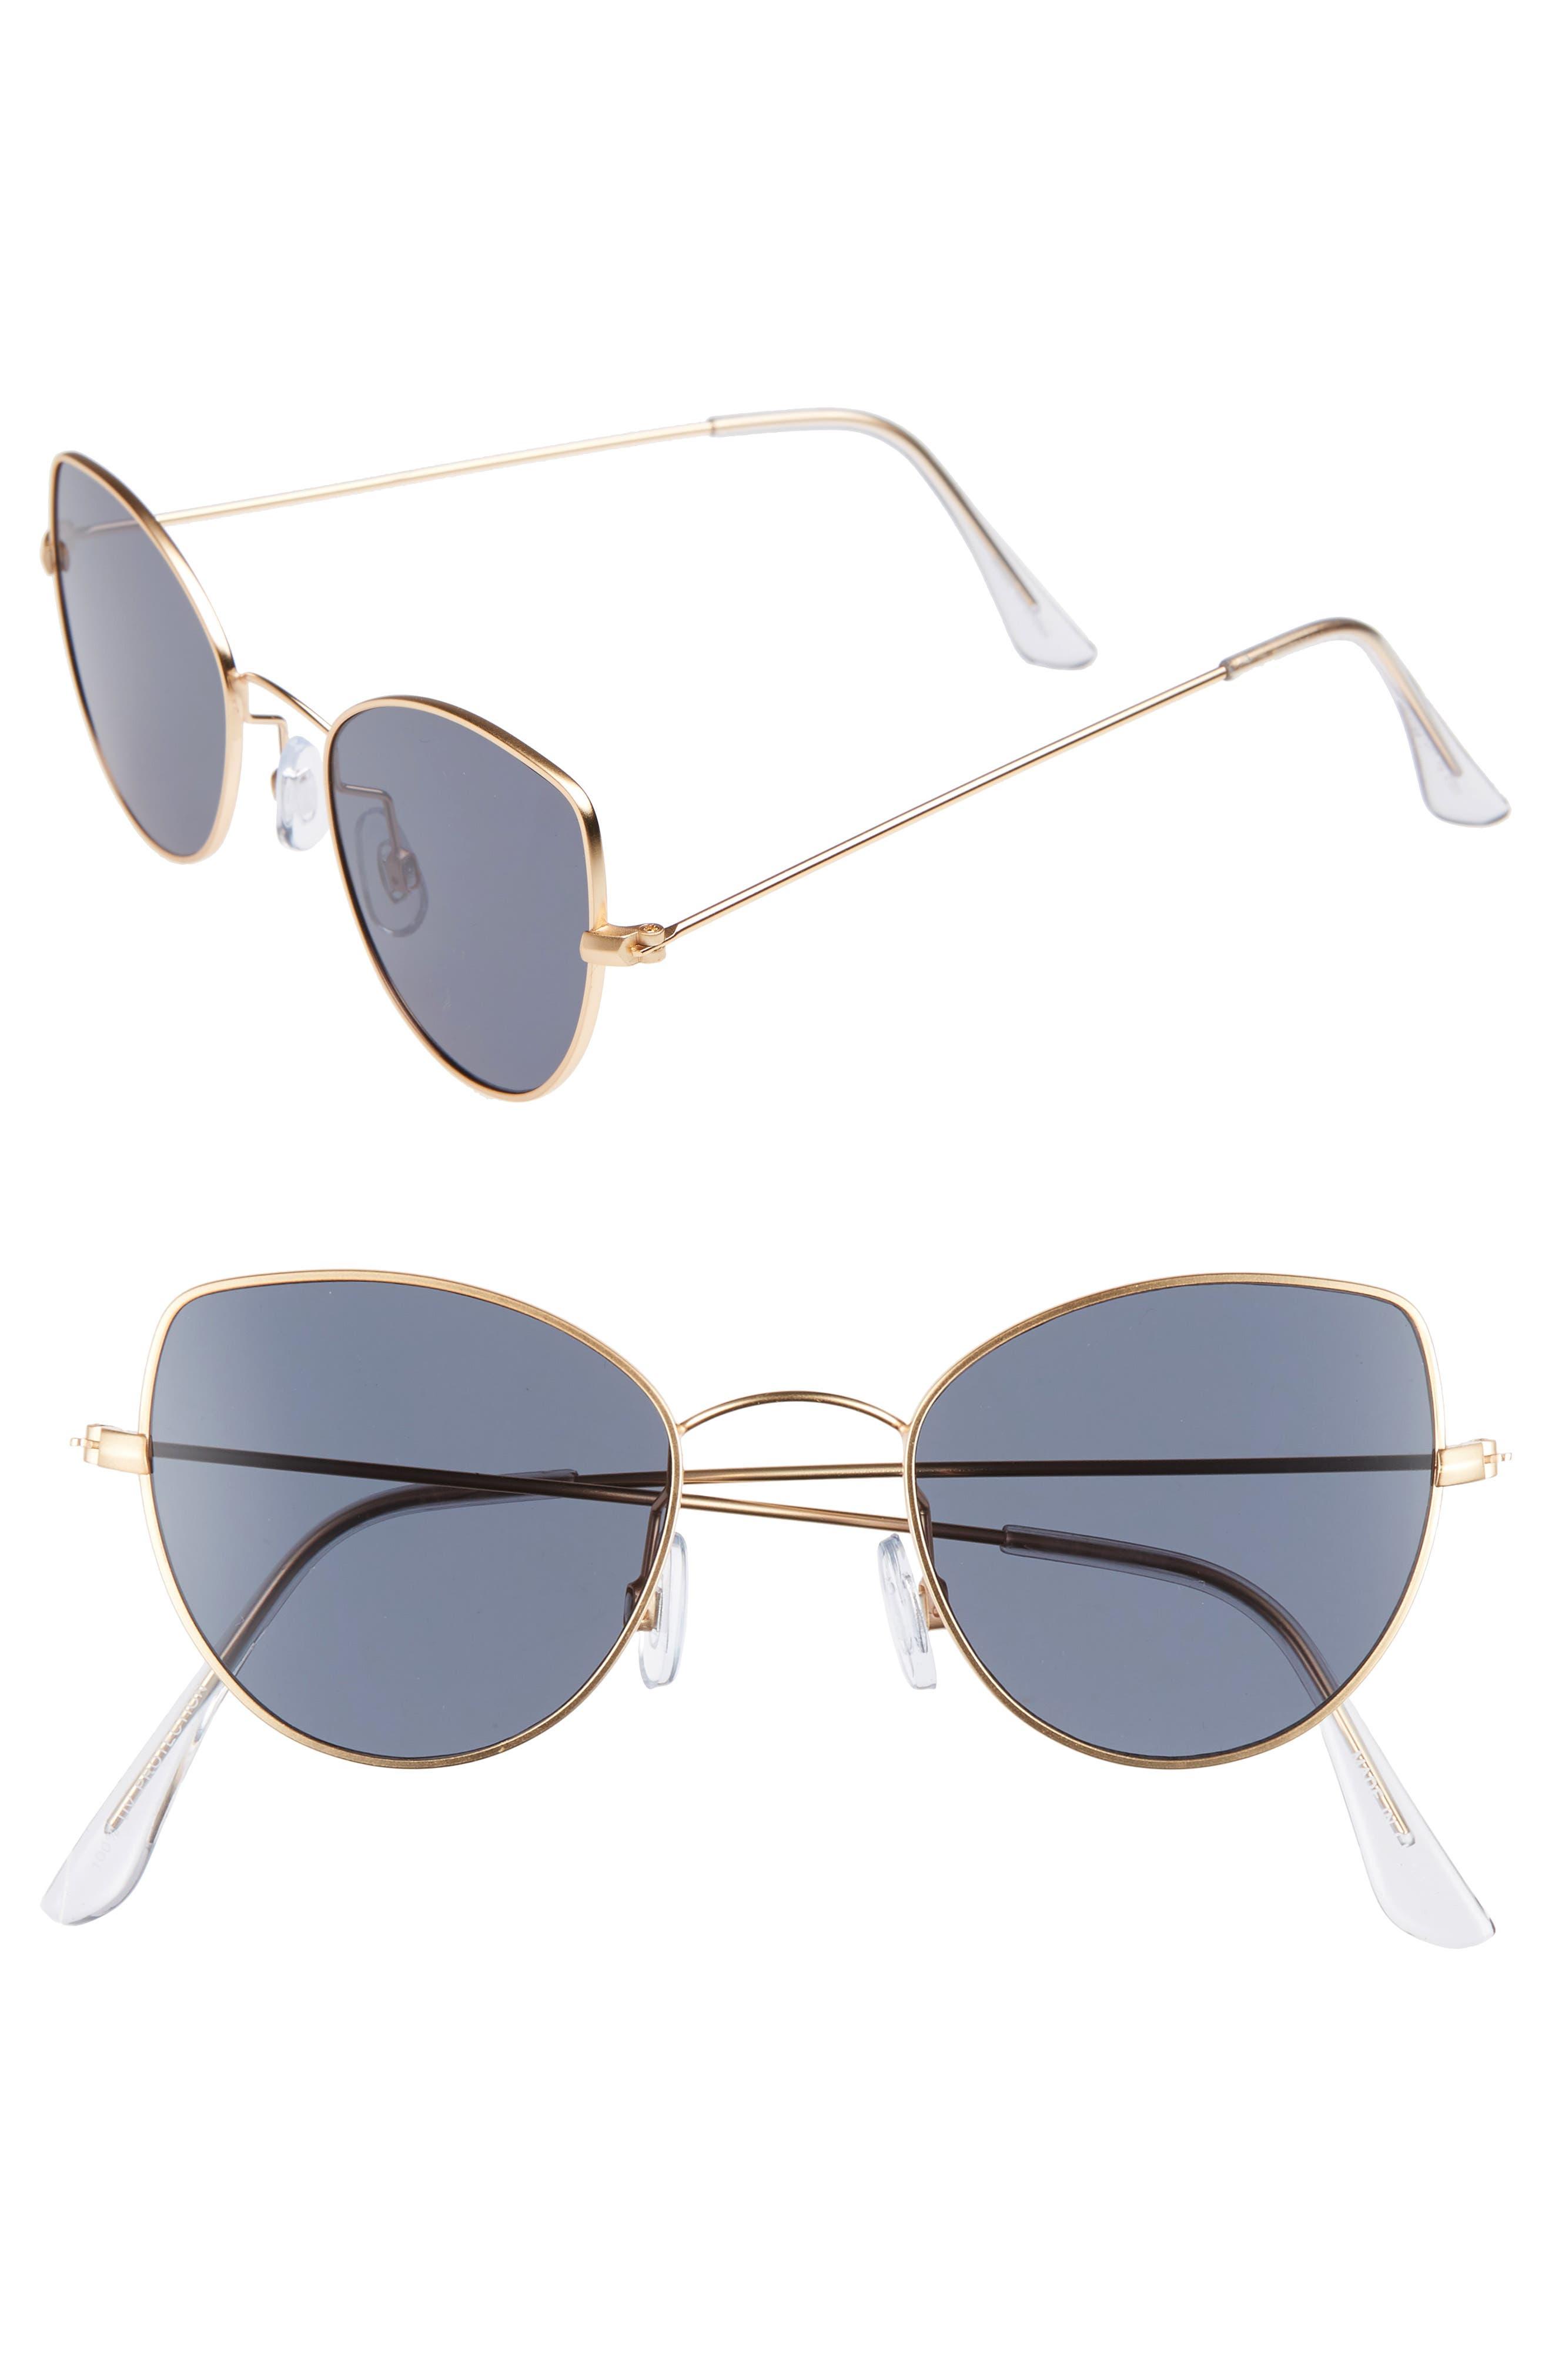 48mm Cat Eye Sunglasses,                         Main,                         color, BLACK/ GOLD